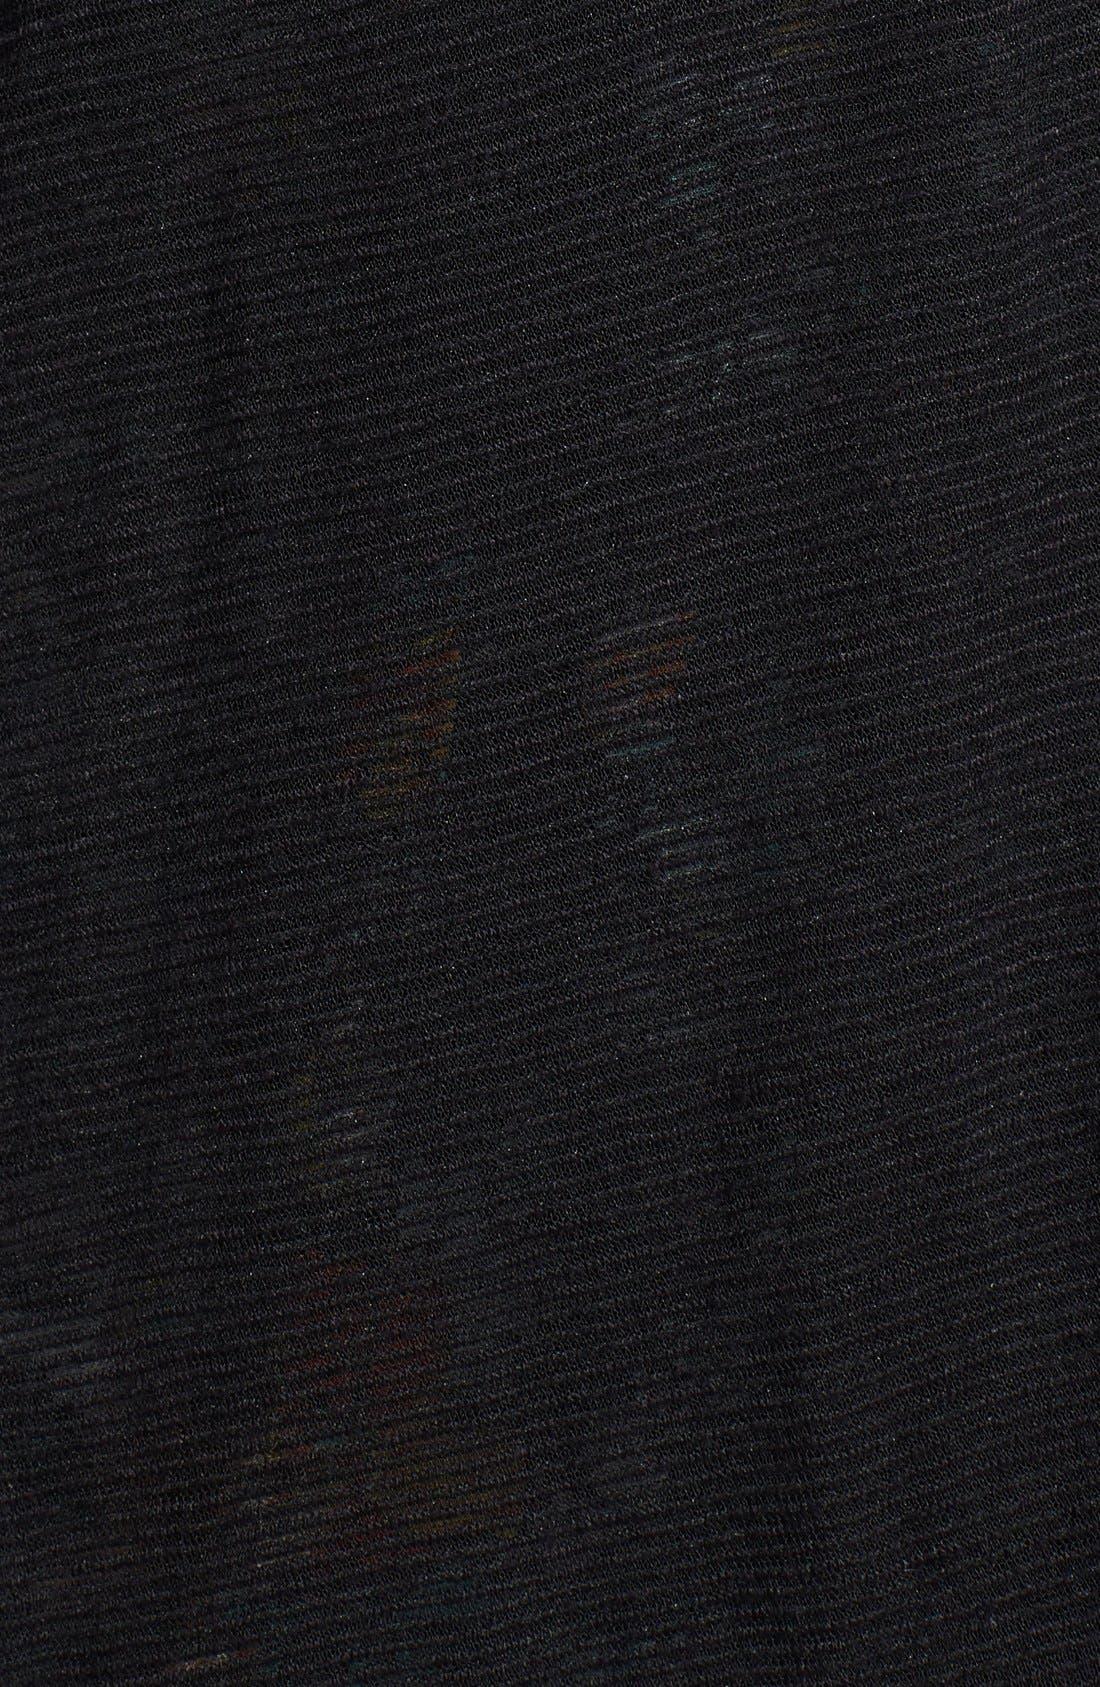 Alternate Image 3  - Jessica Simpson 'Veronica' Chiffon Inset Cardigan (Plus Size)